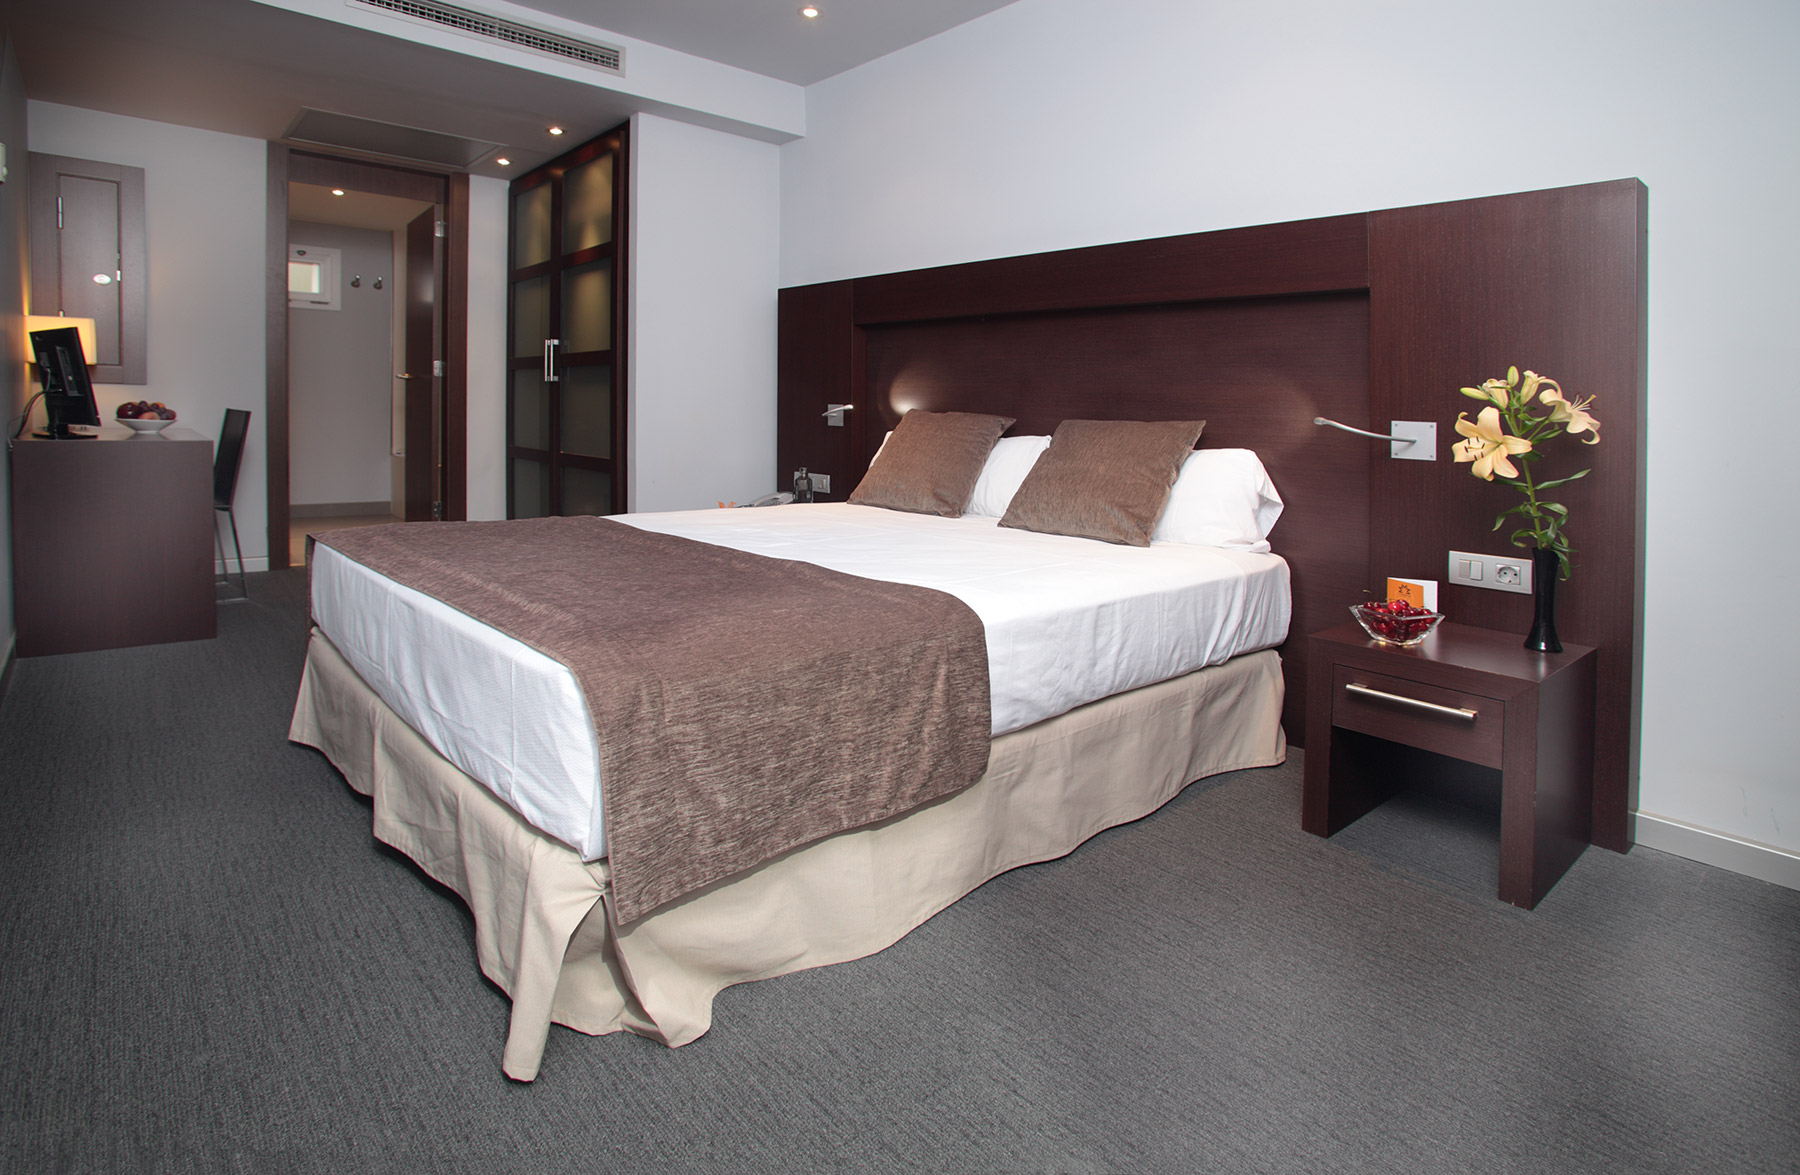 Hotel Madanis Liceo - Spain - Barcelona